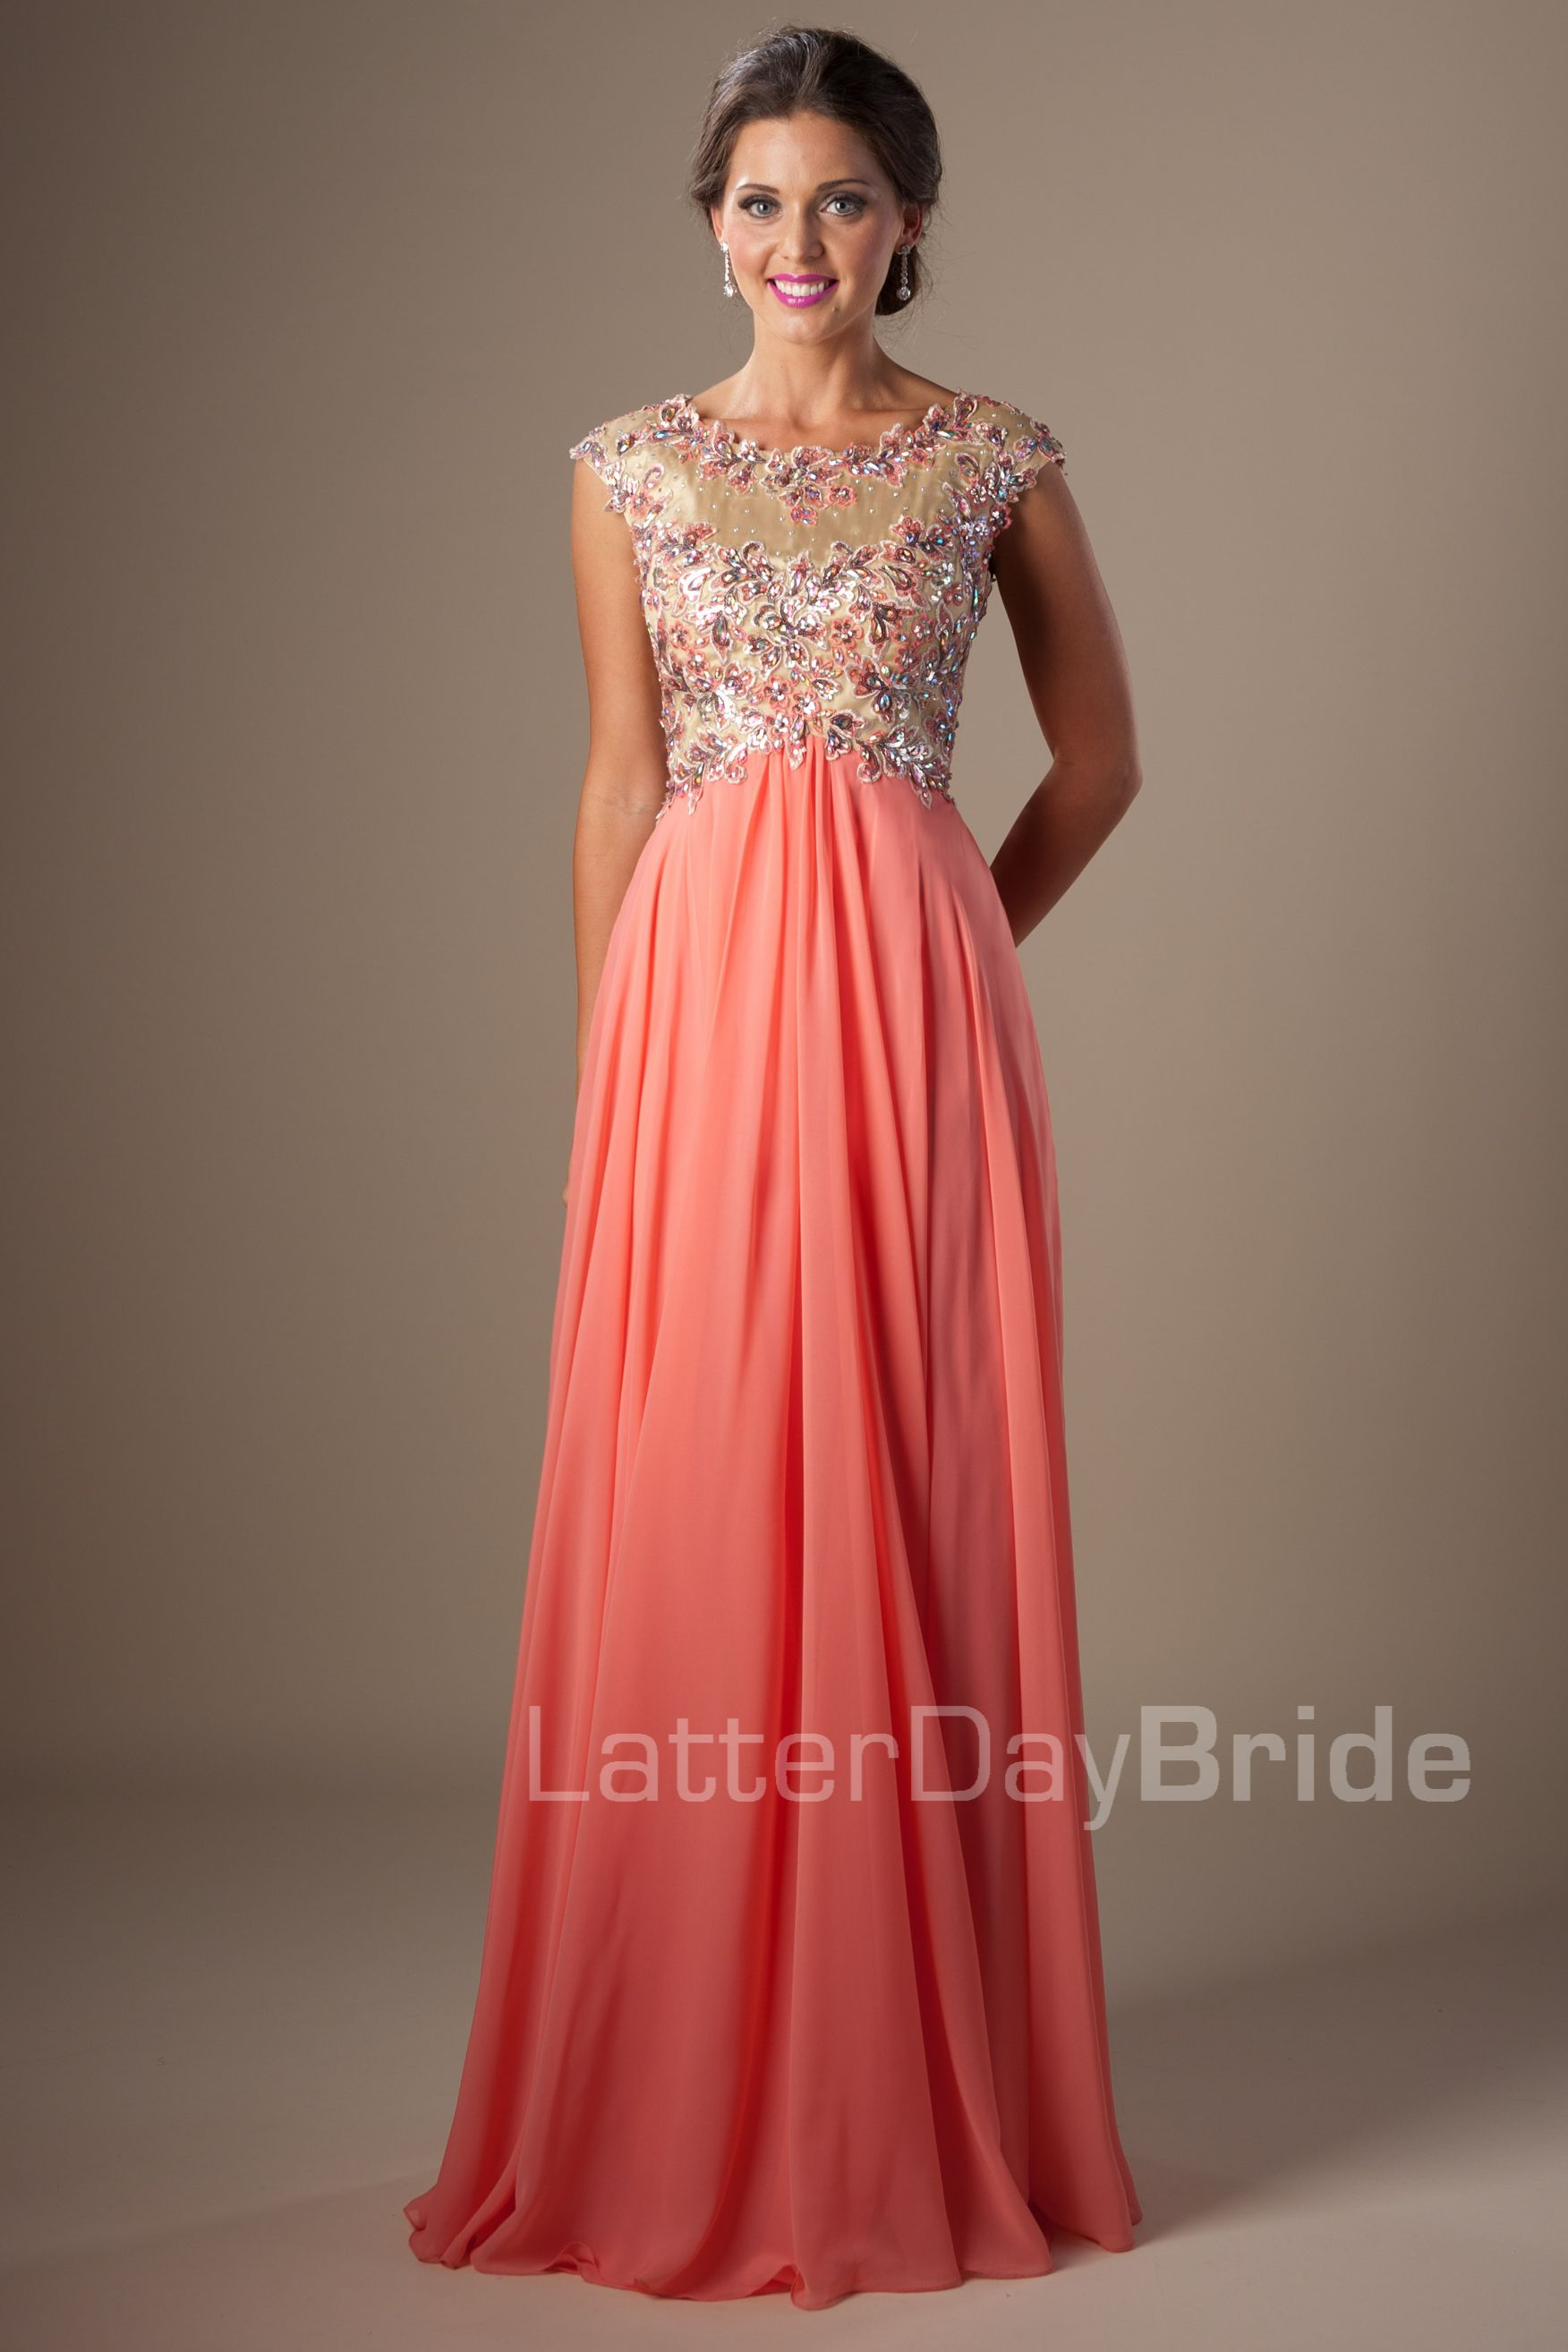 Sherri Hill via alibaba.com - Prom Ideas - Pinterest - Beautiful ...